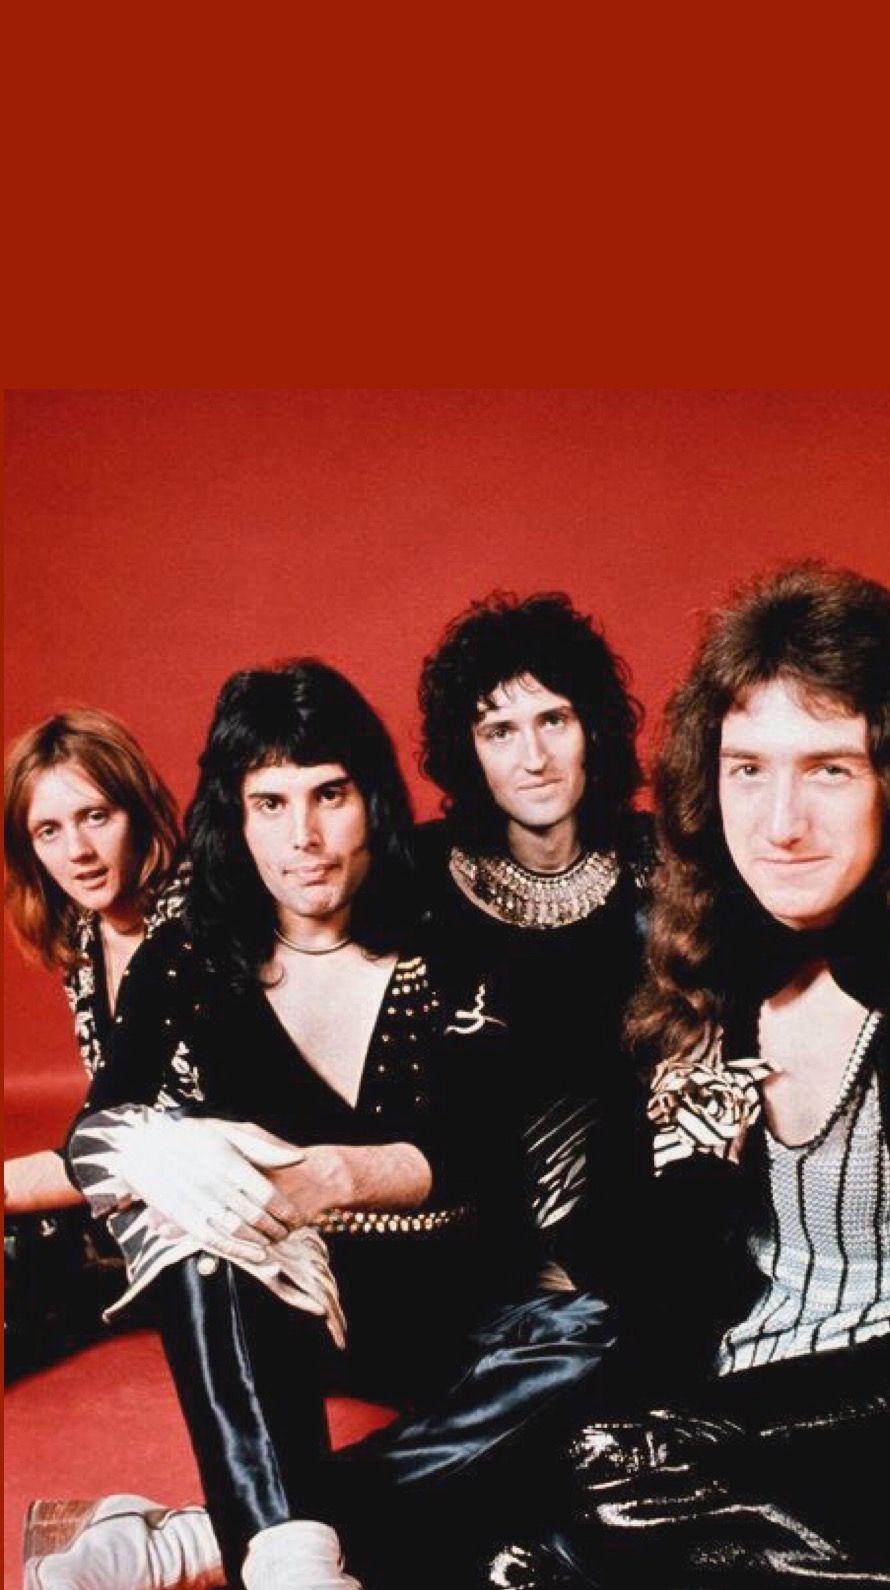 Pin By Lourdes On Queen Phone Wallpapers Queen Photos Freddie Mercury Queen Band